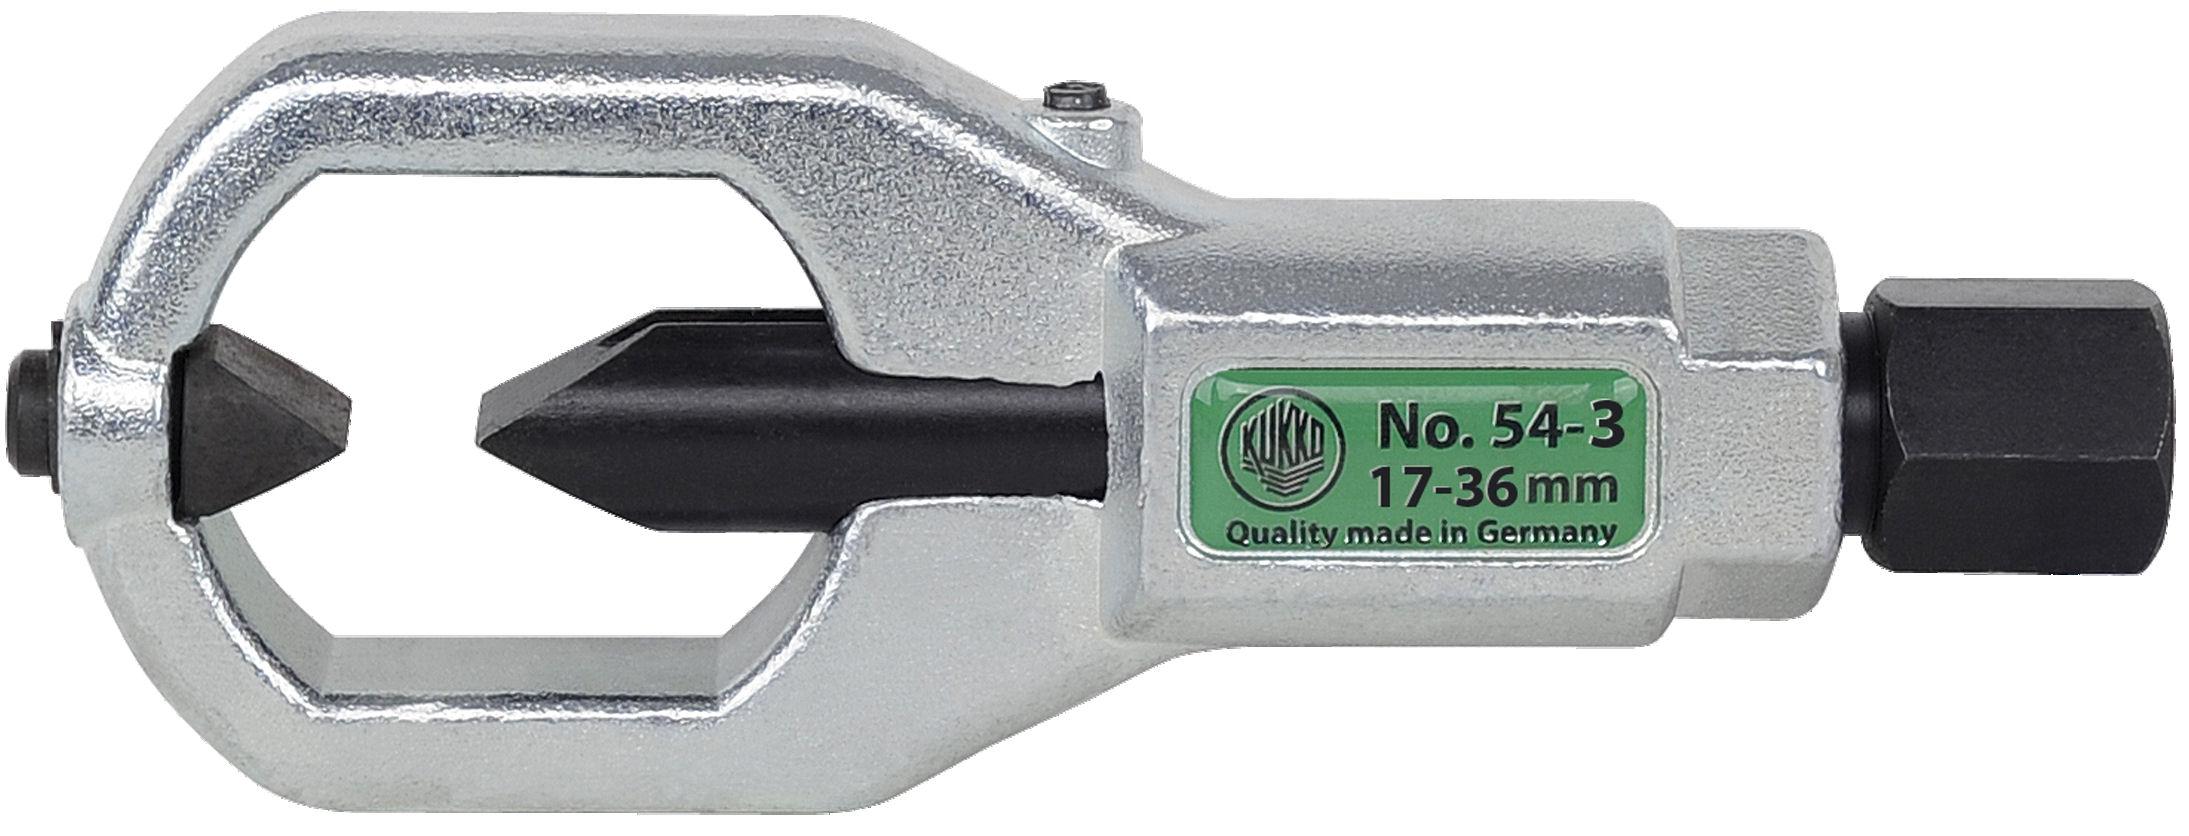 54-3 Kukko Double Edged Mechanic Nut Splitter for Nuts 17-36mm image 2